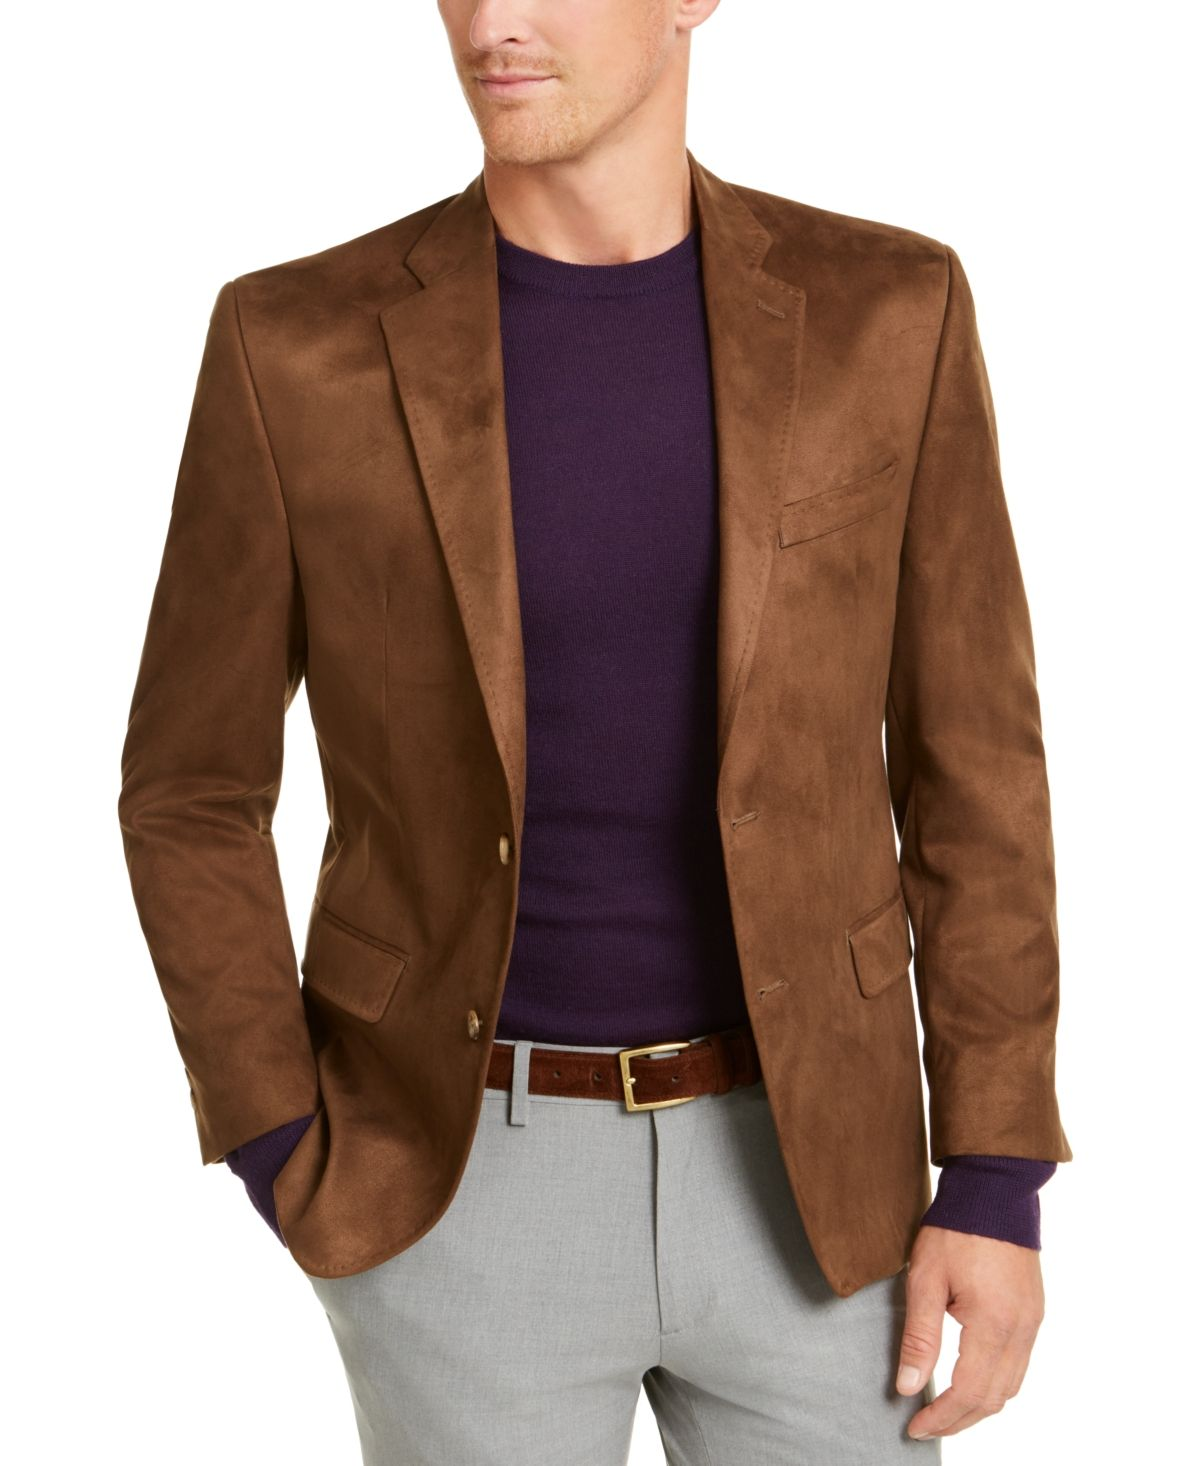 Lauren Ralph Lauren Men S Classic Fit Faux Suede Sport Coat Copper Blazer Outfits Men Streetwear Men Outfits Brown Jacket Men